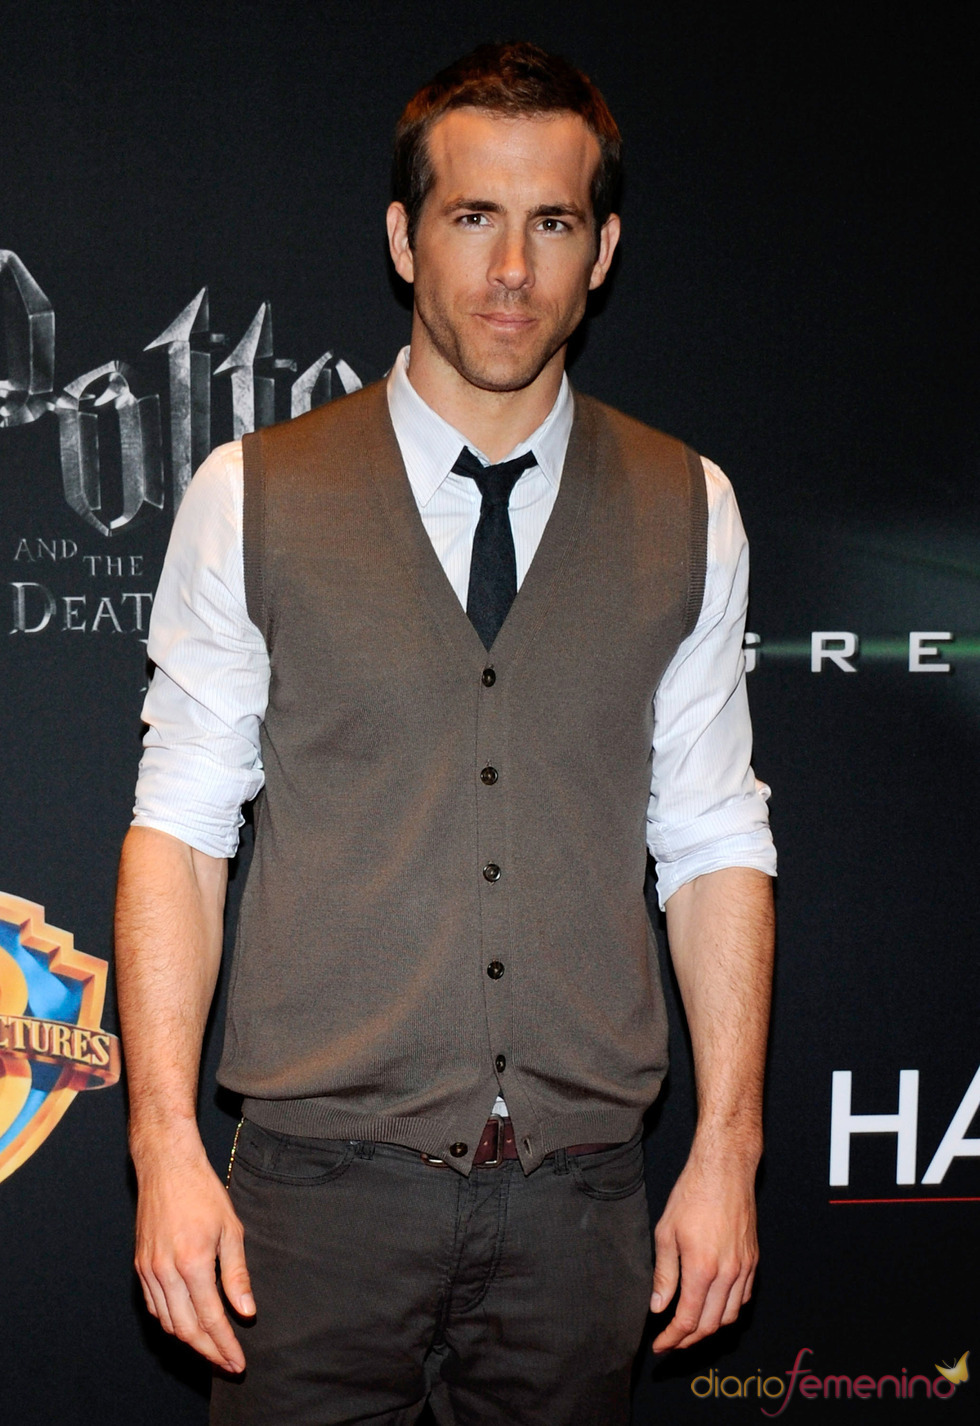 Ryan Reynolds, padrino del festival CinemaCon